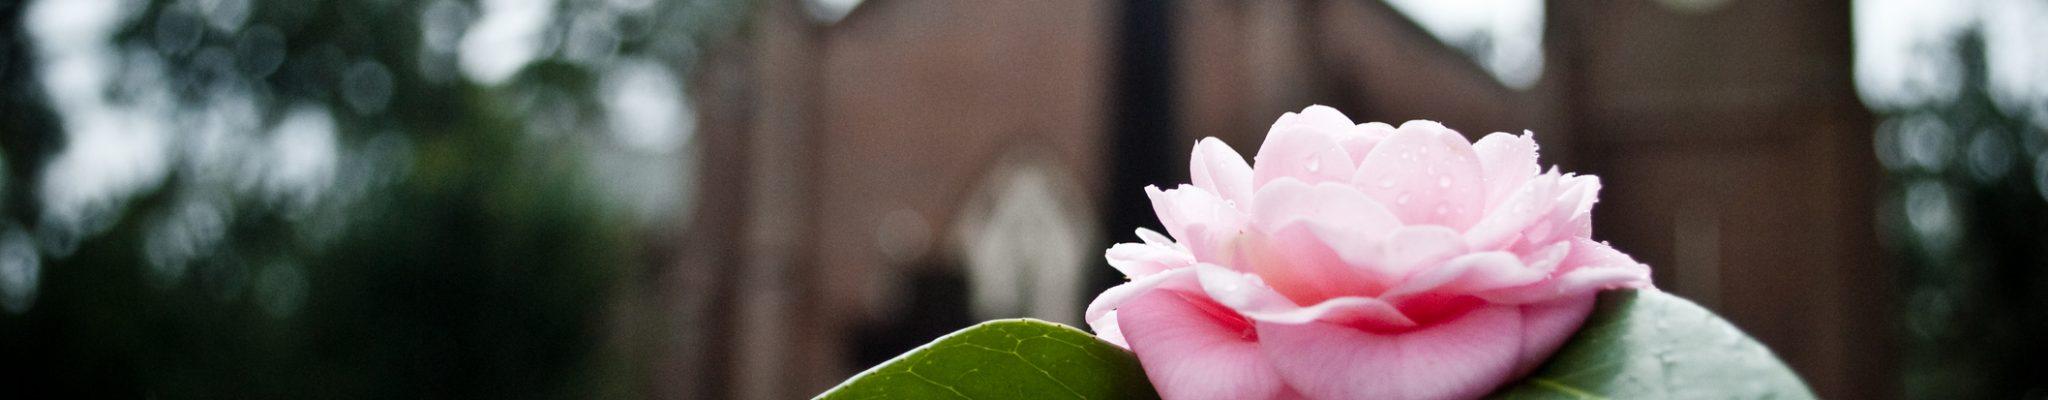 Rose on grave